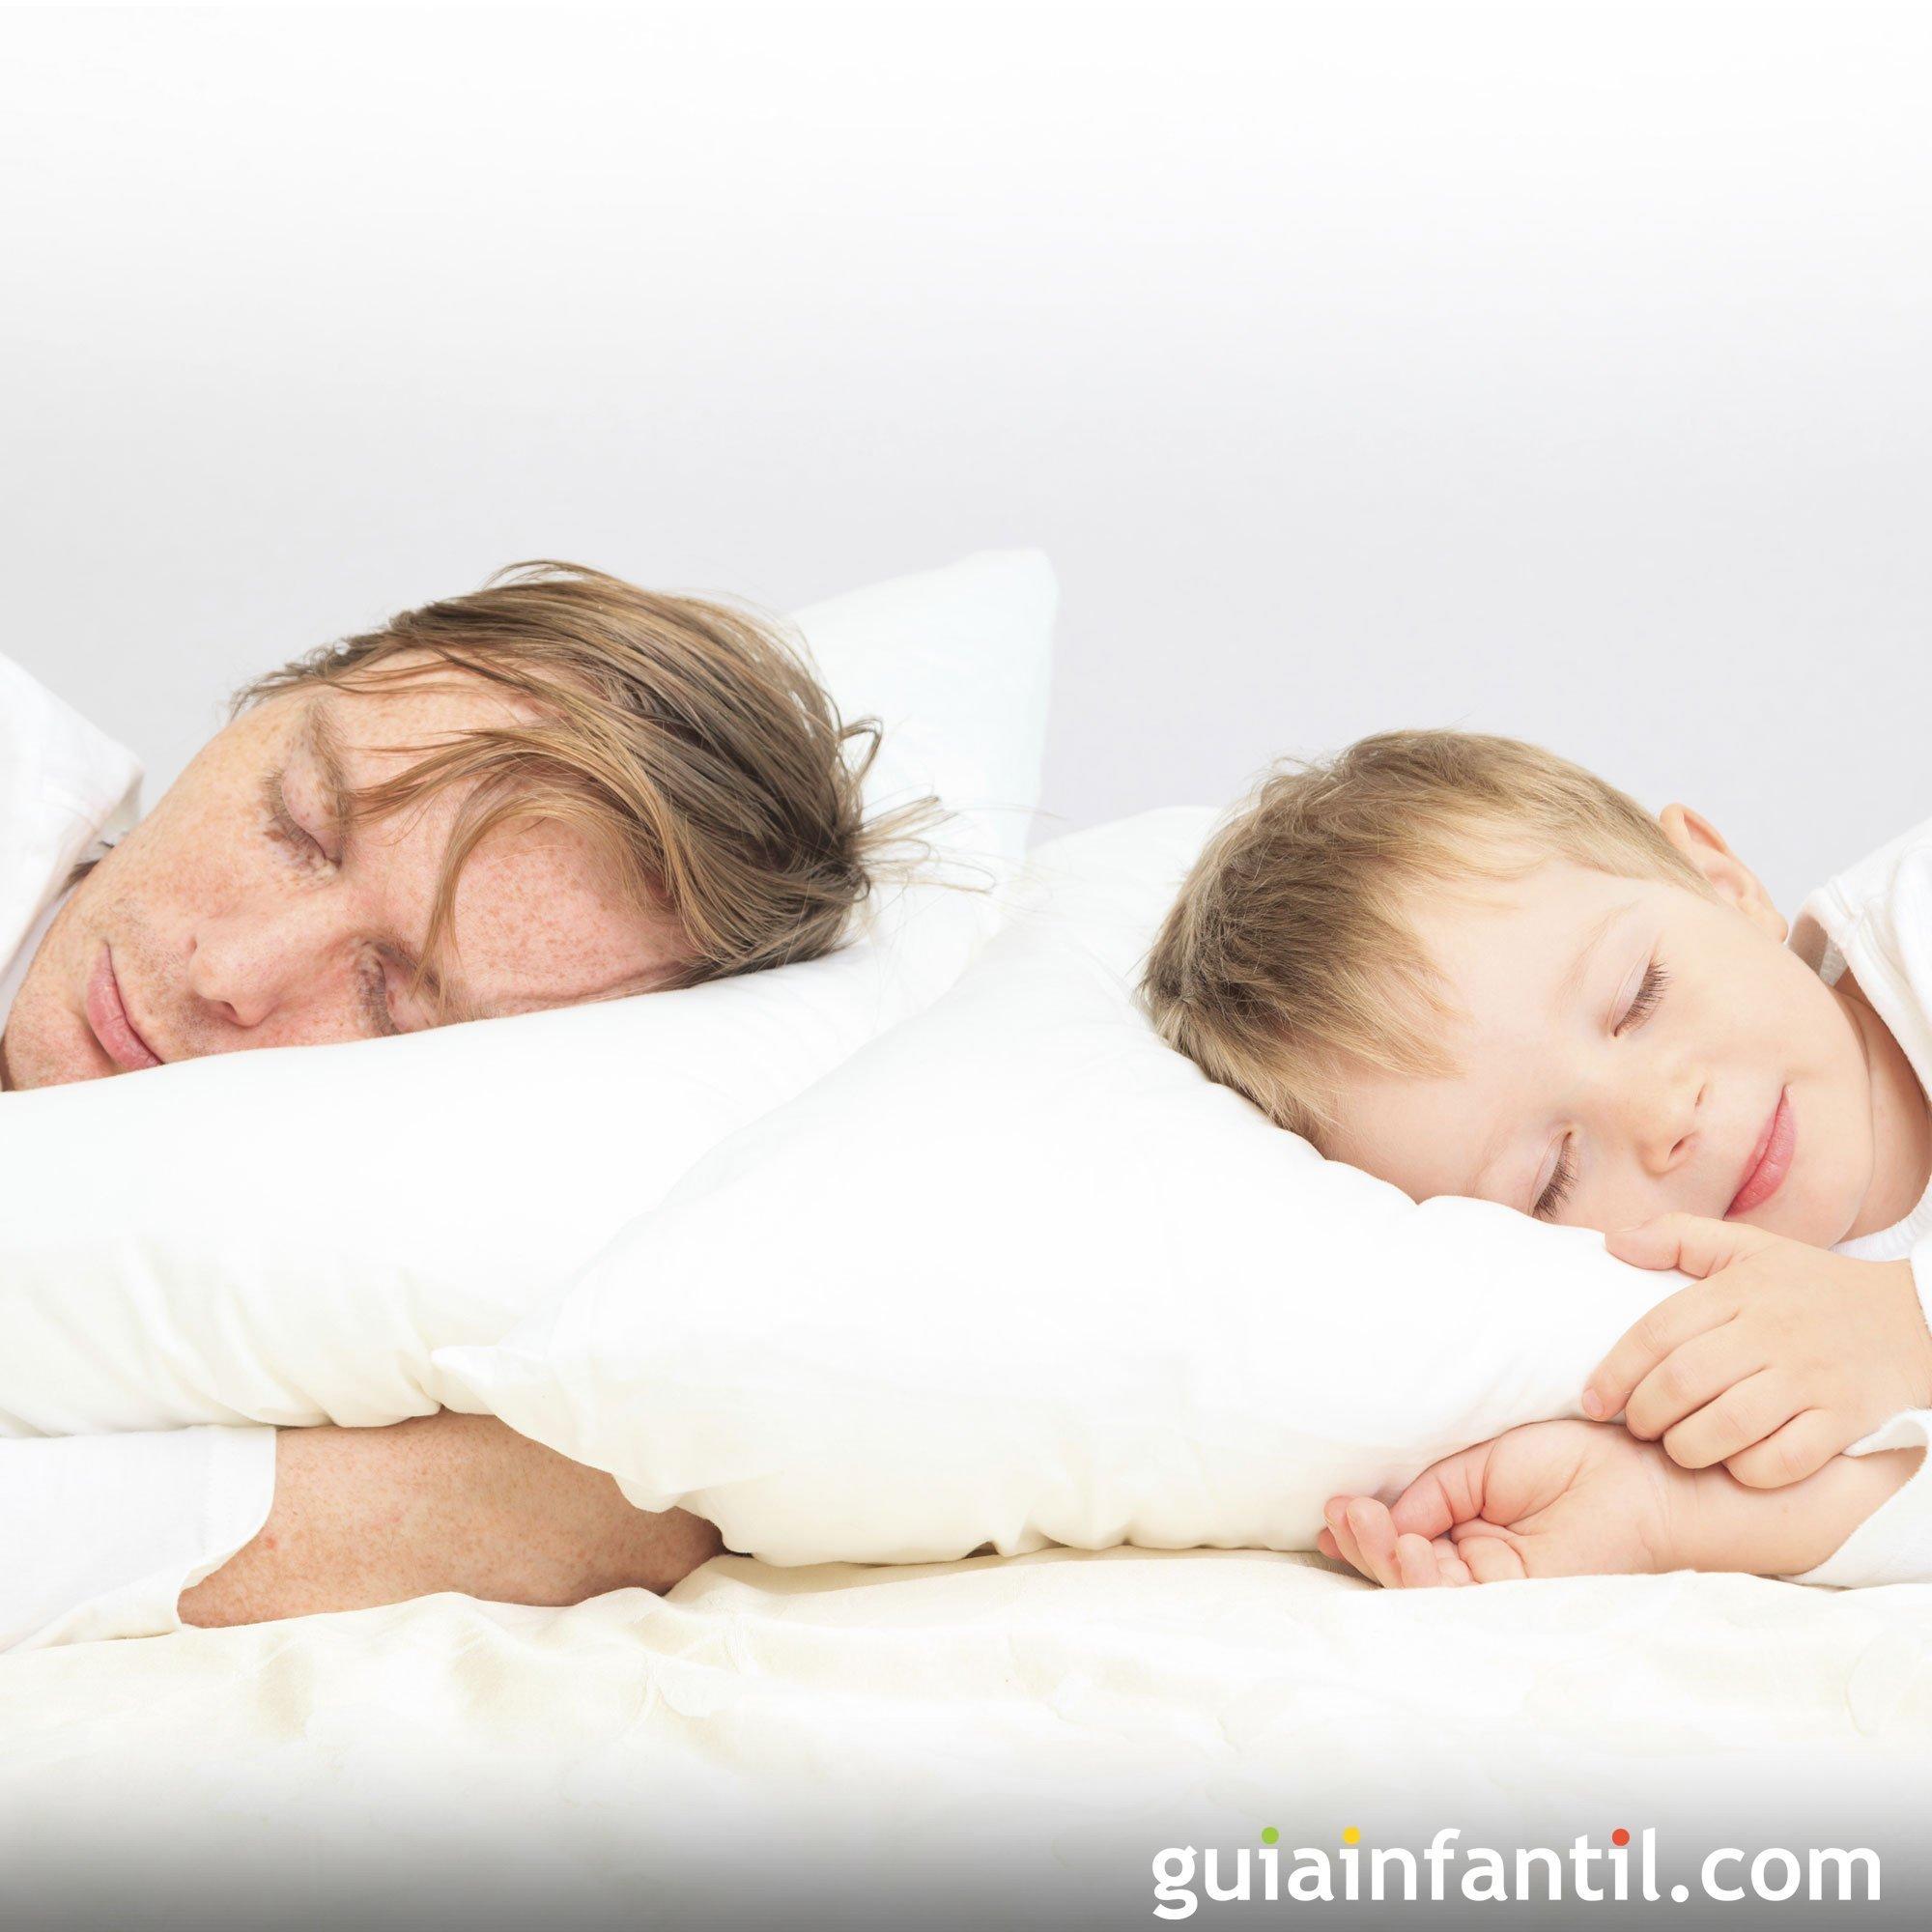 Foto de padre e hijo durmiendo la siesta juntos